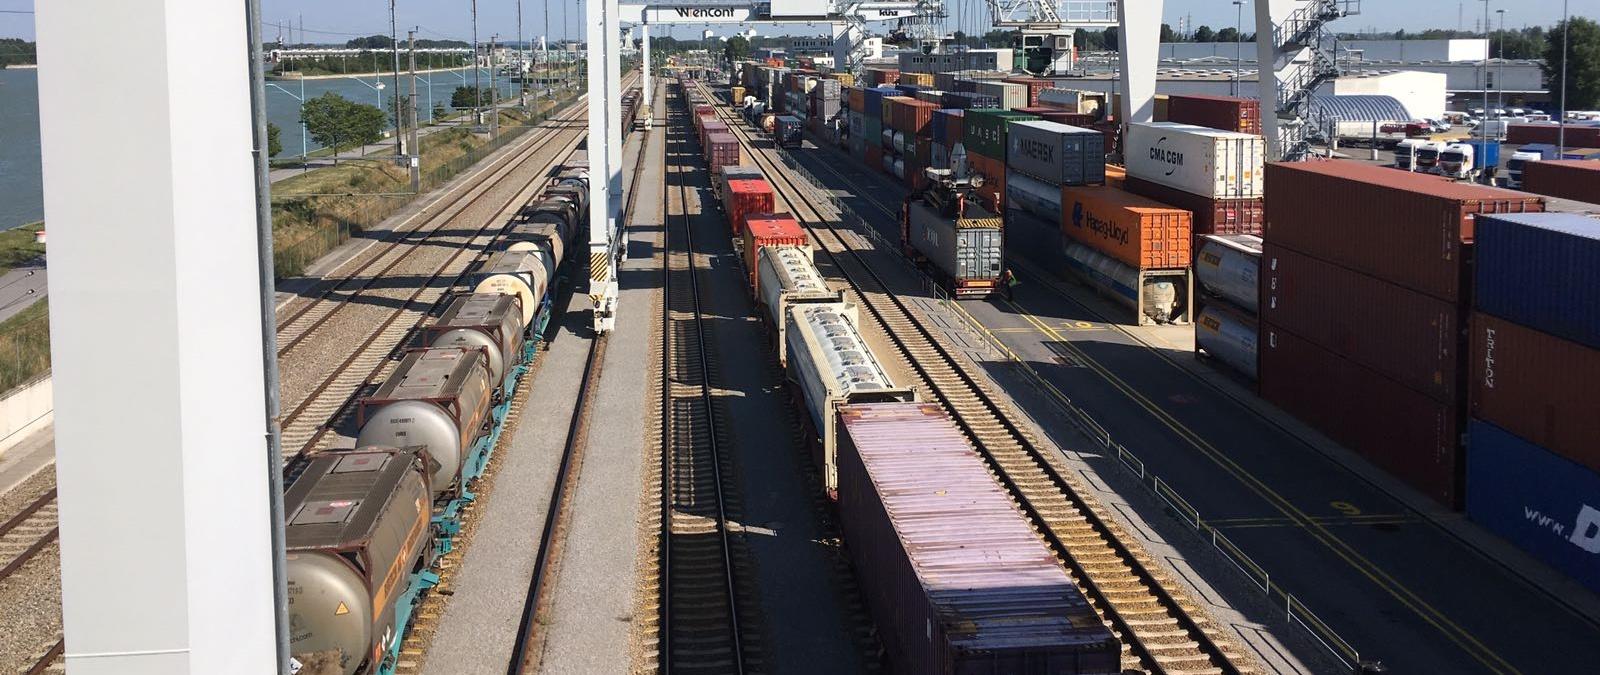 2.5 mn € for intermodal transport